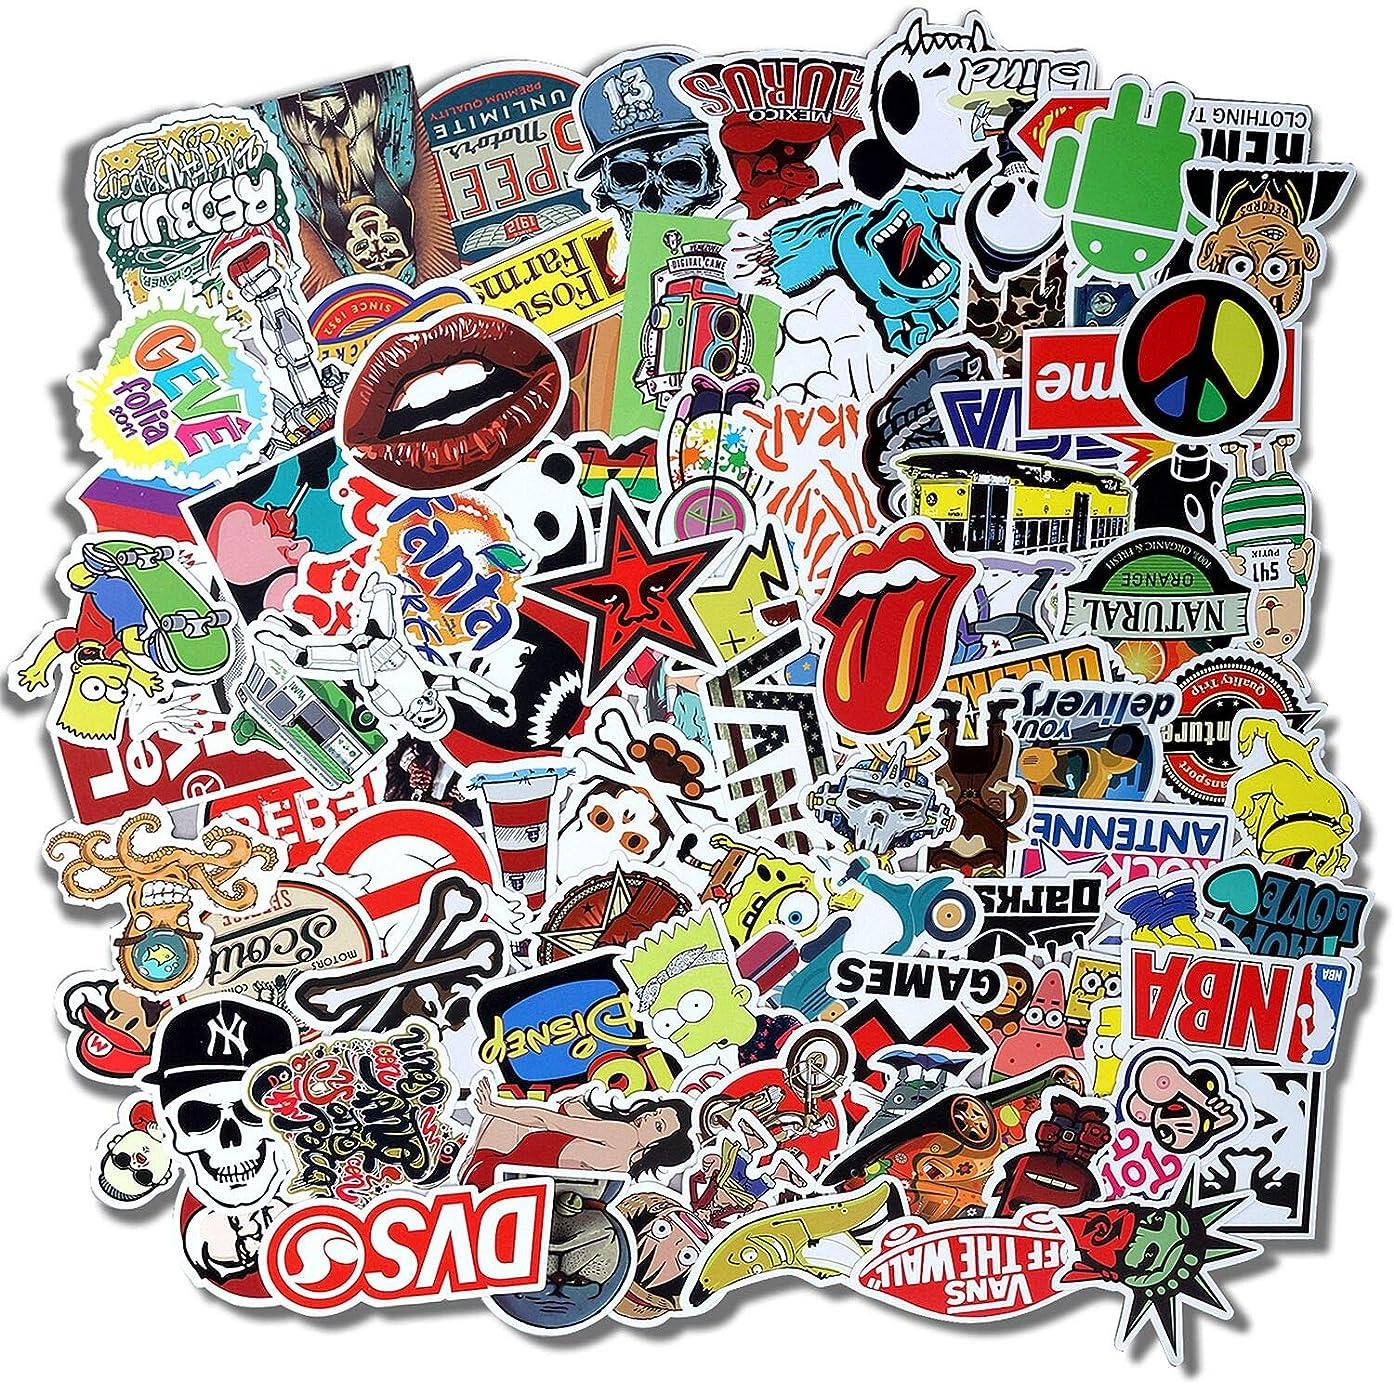 Graffiti Vinyl Stickers for Laptop Door Window,Car,Motorcycle Bicycle,Luggage, Skateboard(100 pcs) No-Duplicate Sticker Pack